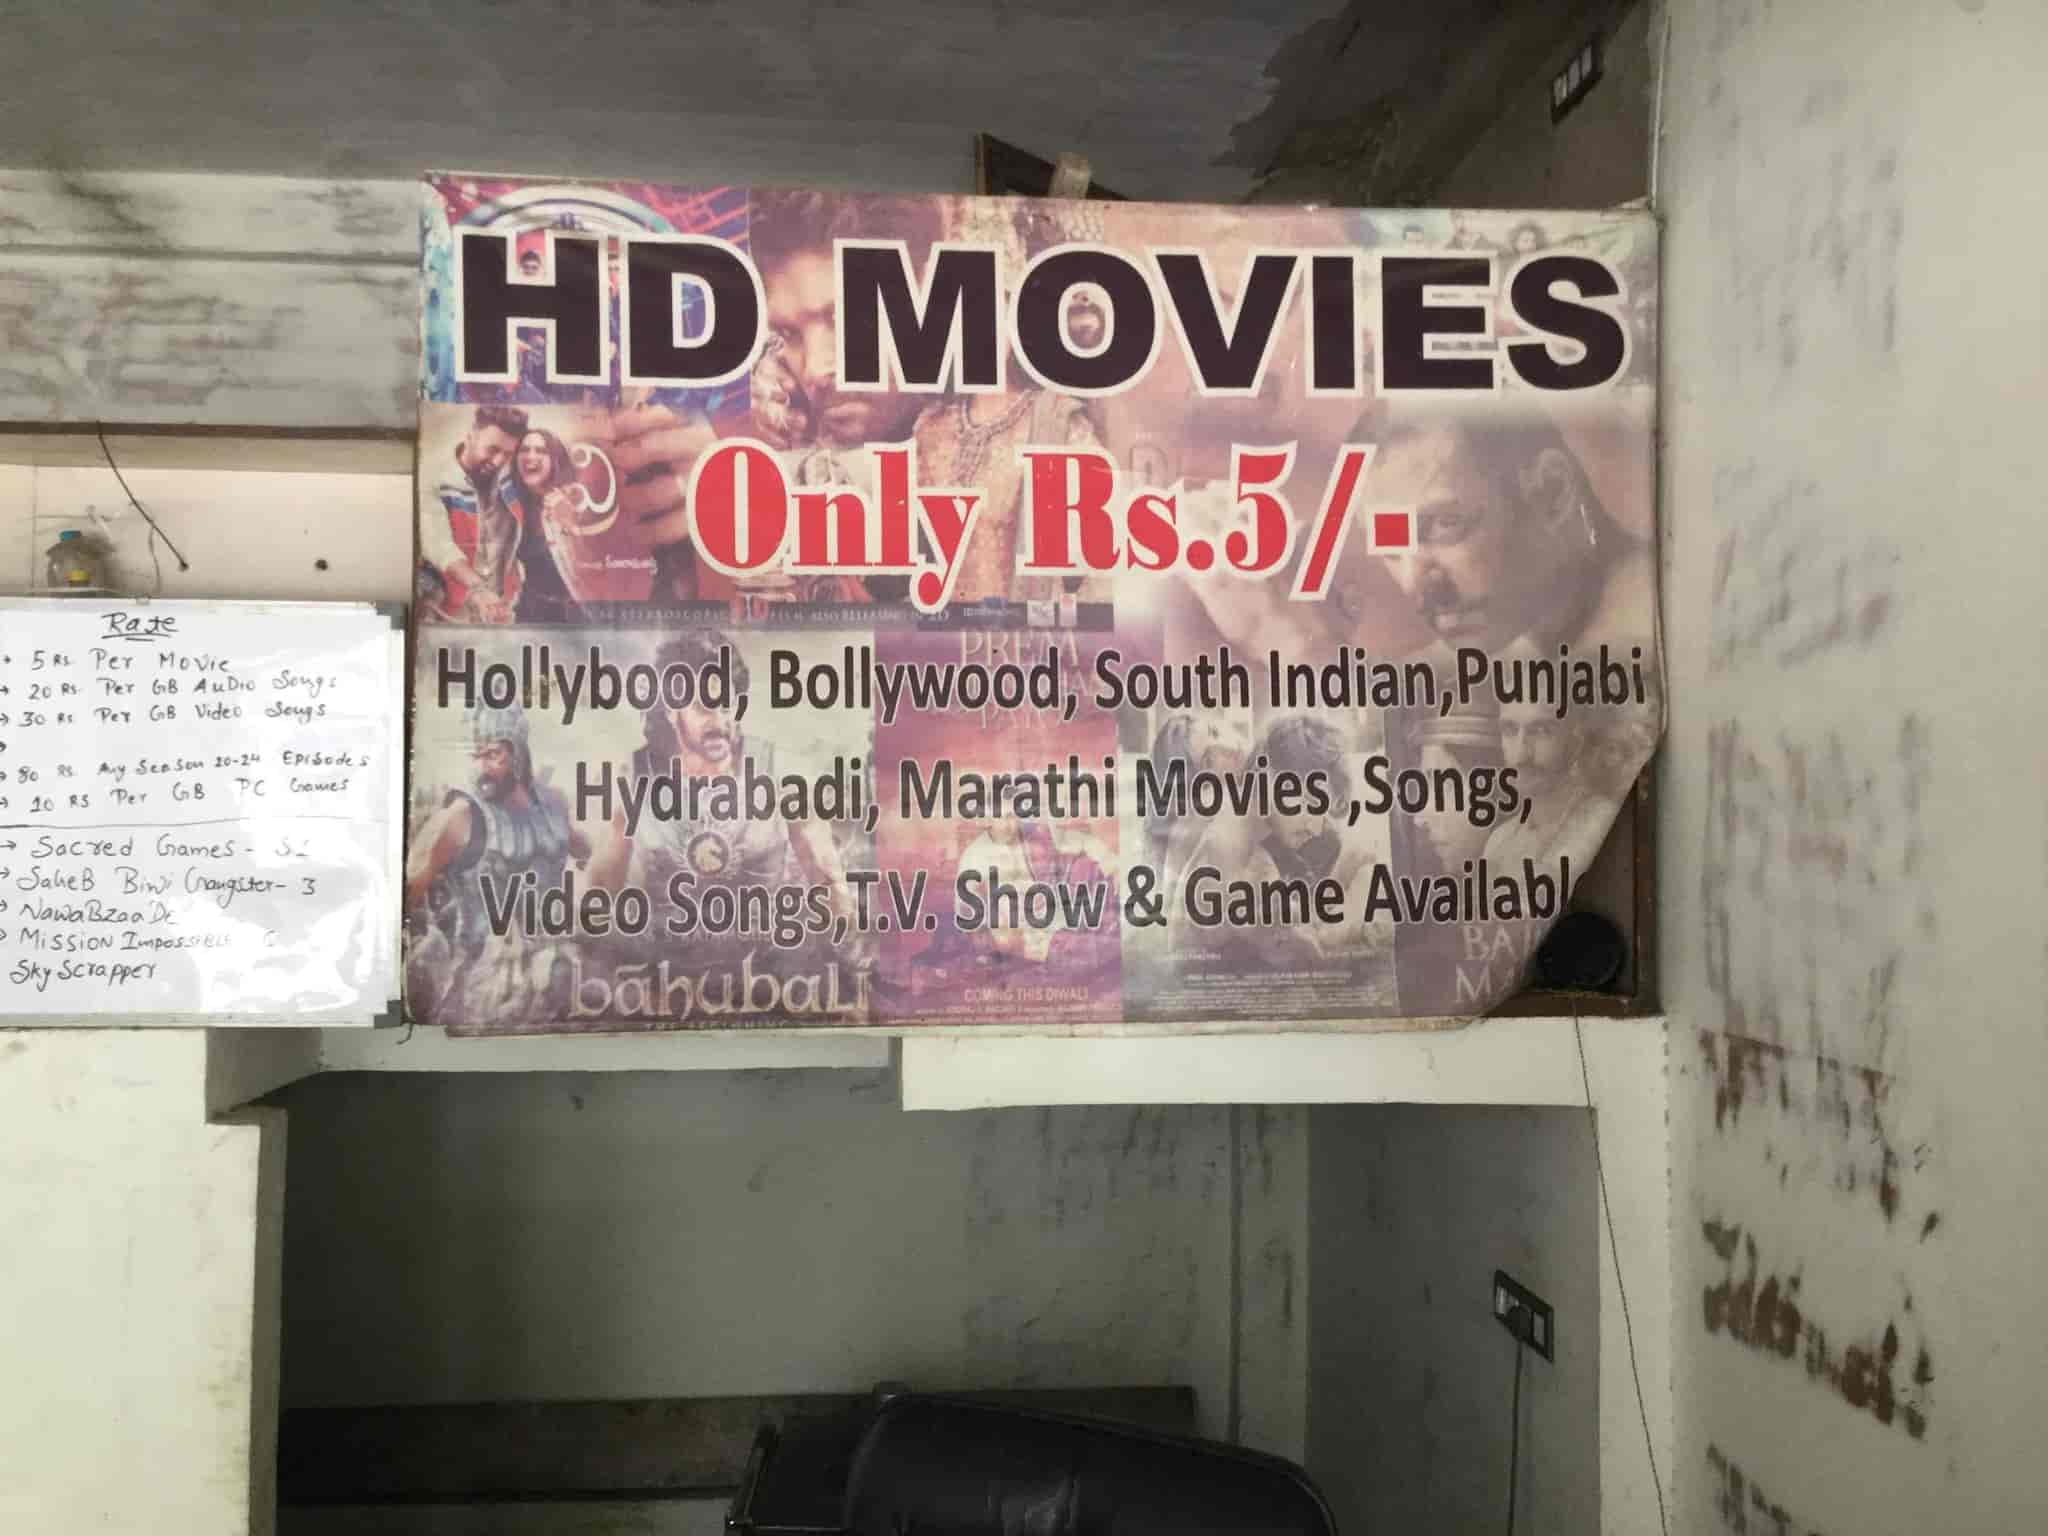 Top 4 movie downloading services in v s s nagar, bhubaneshwar.